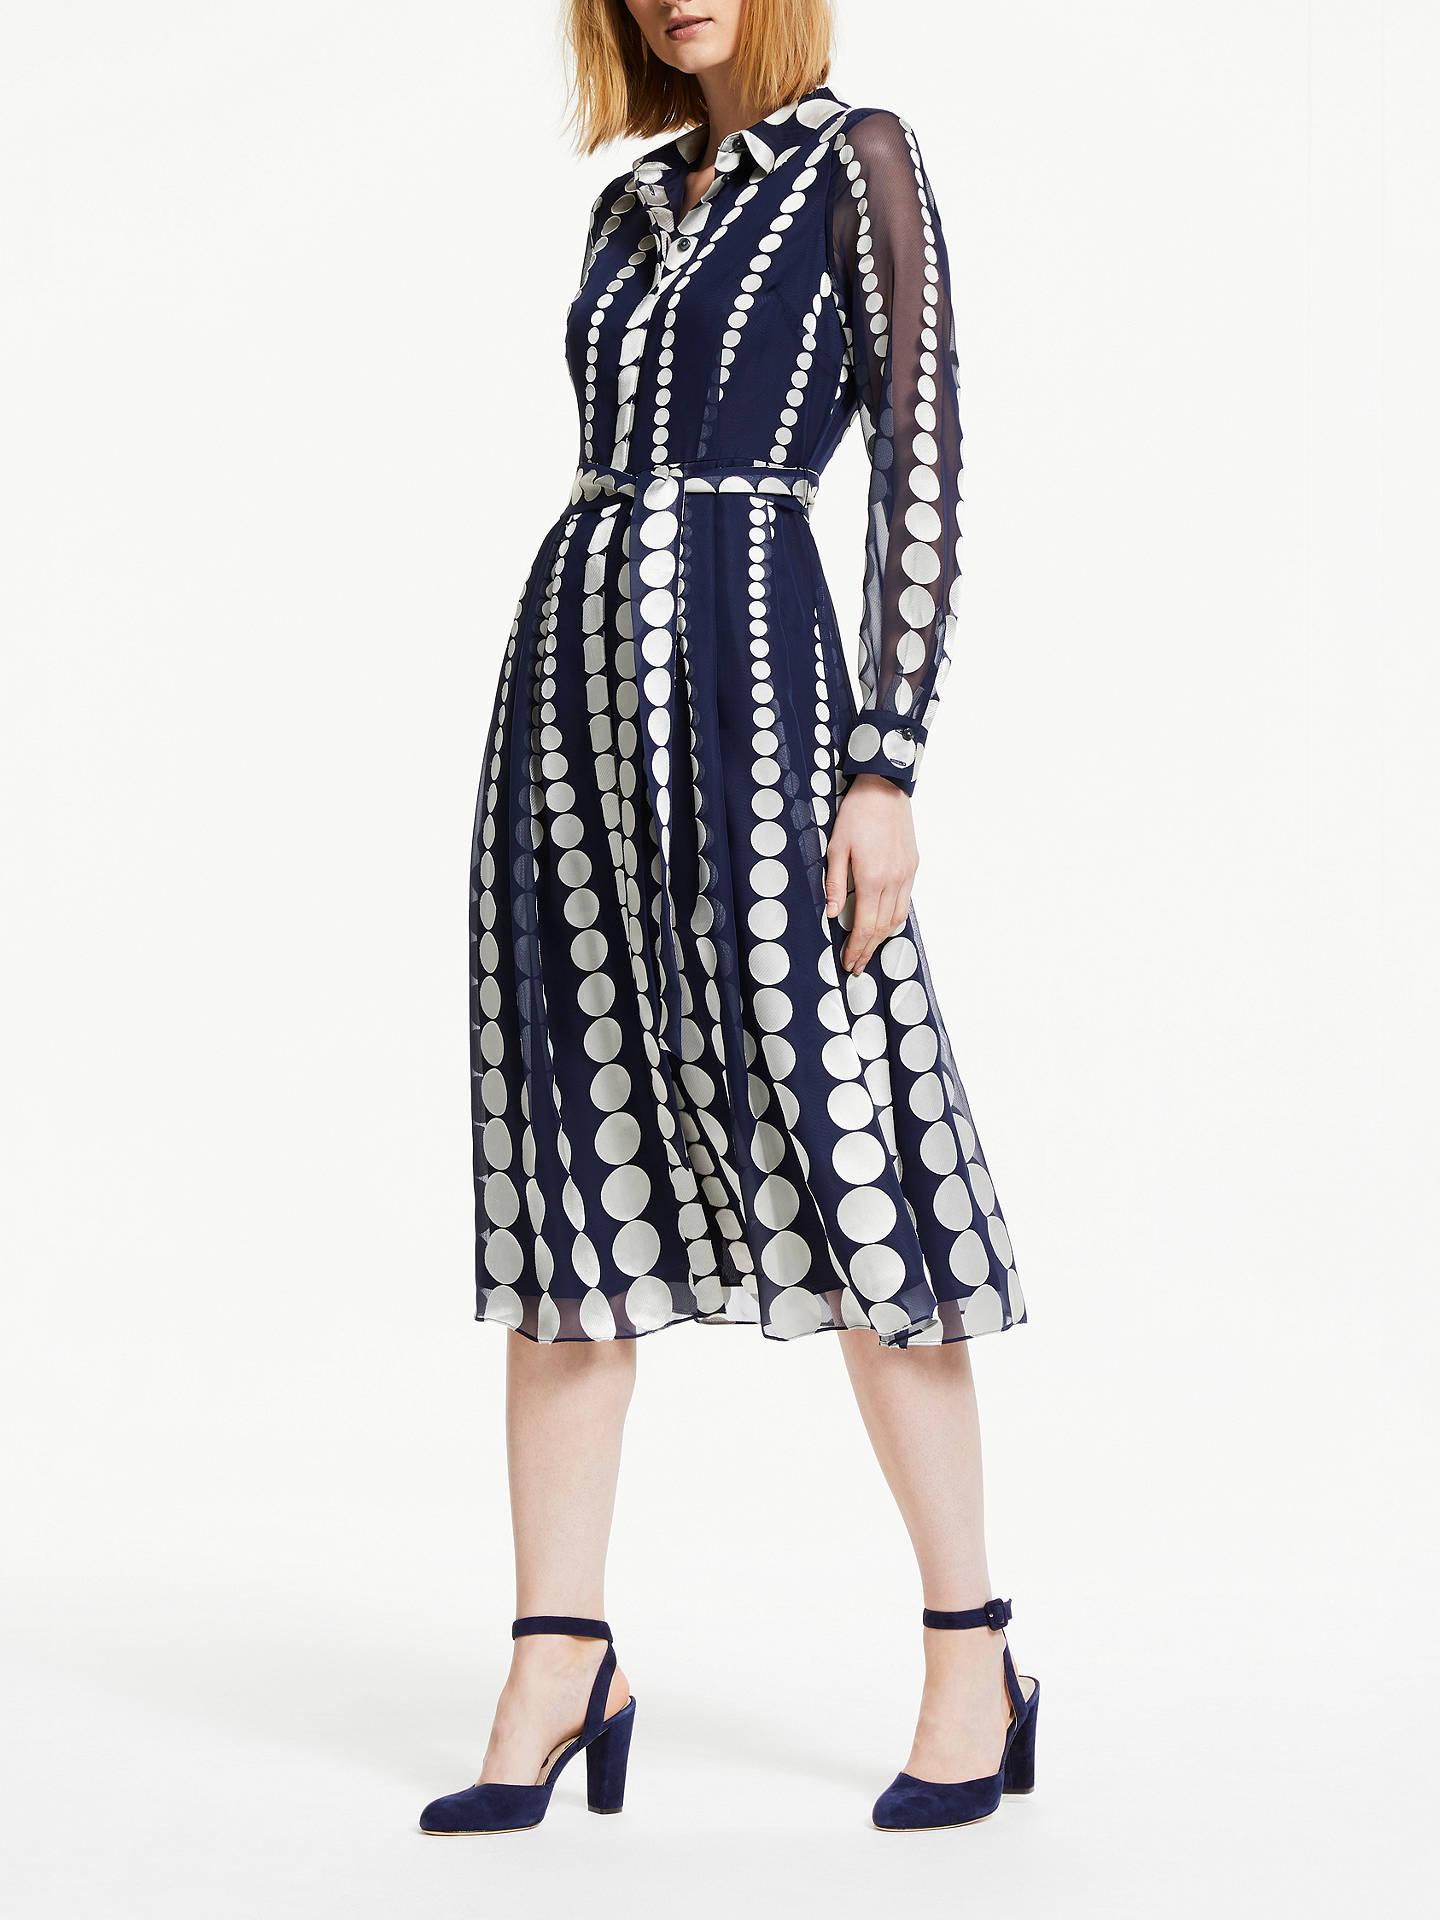 ecf41617d2 Buy Boden Genevieve Spot Print Tie Waist Midi Dress, Navy, 16 Online at  johnlewis ...